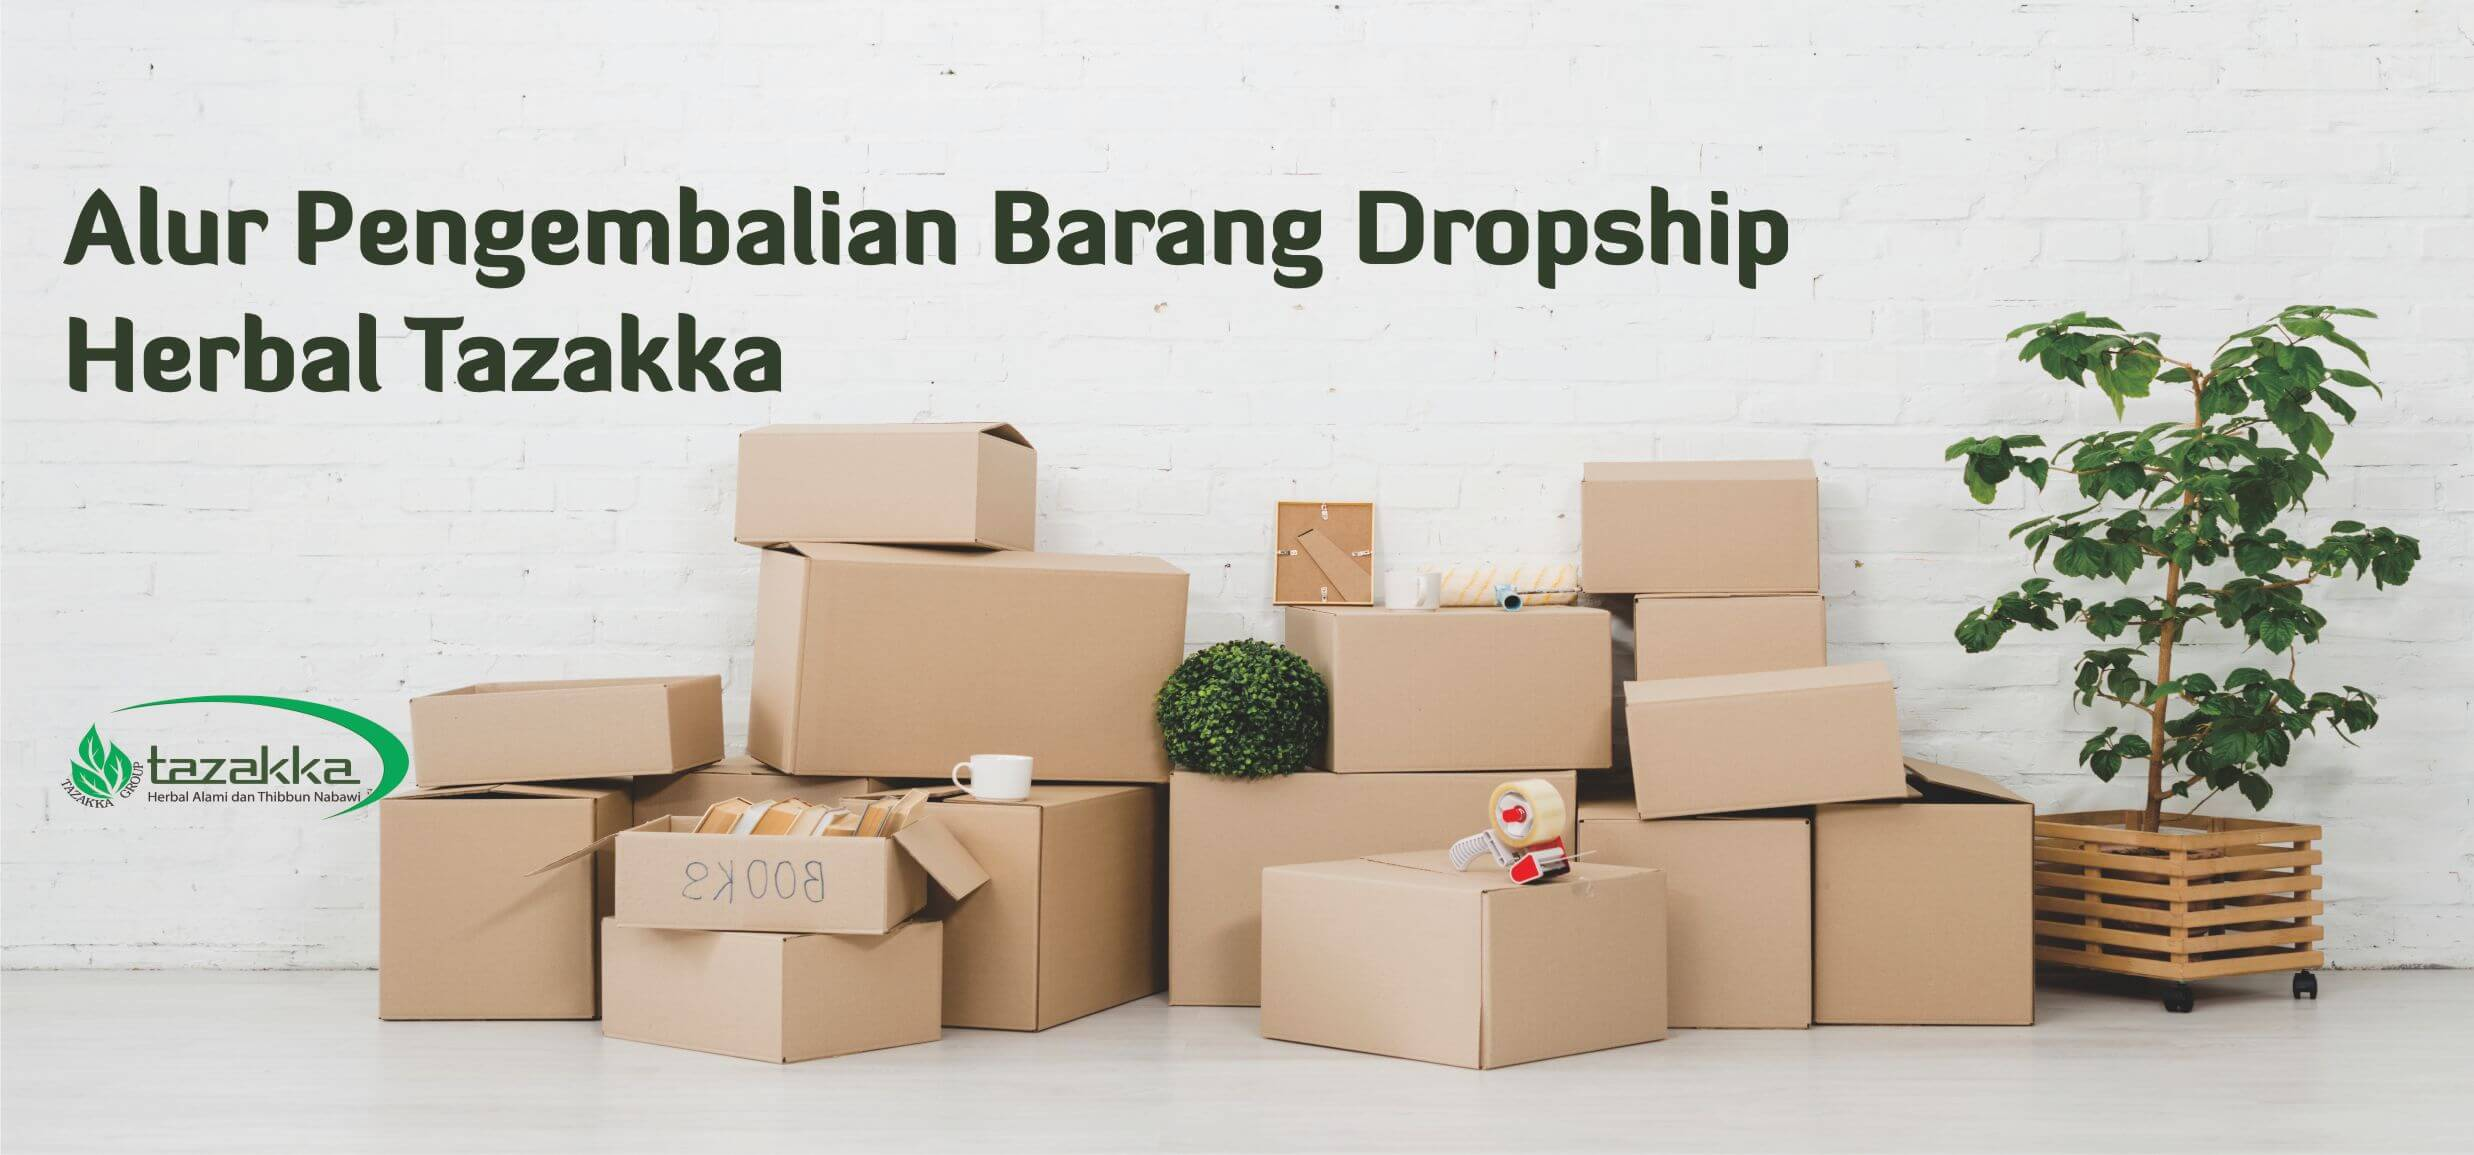 Alur Pengembalian Barang Dropship return product Herbal Tazakka